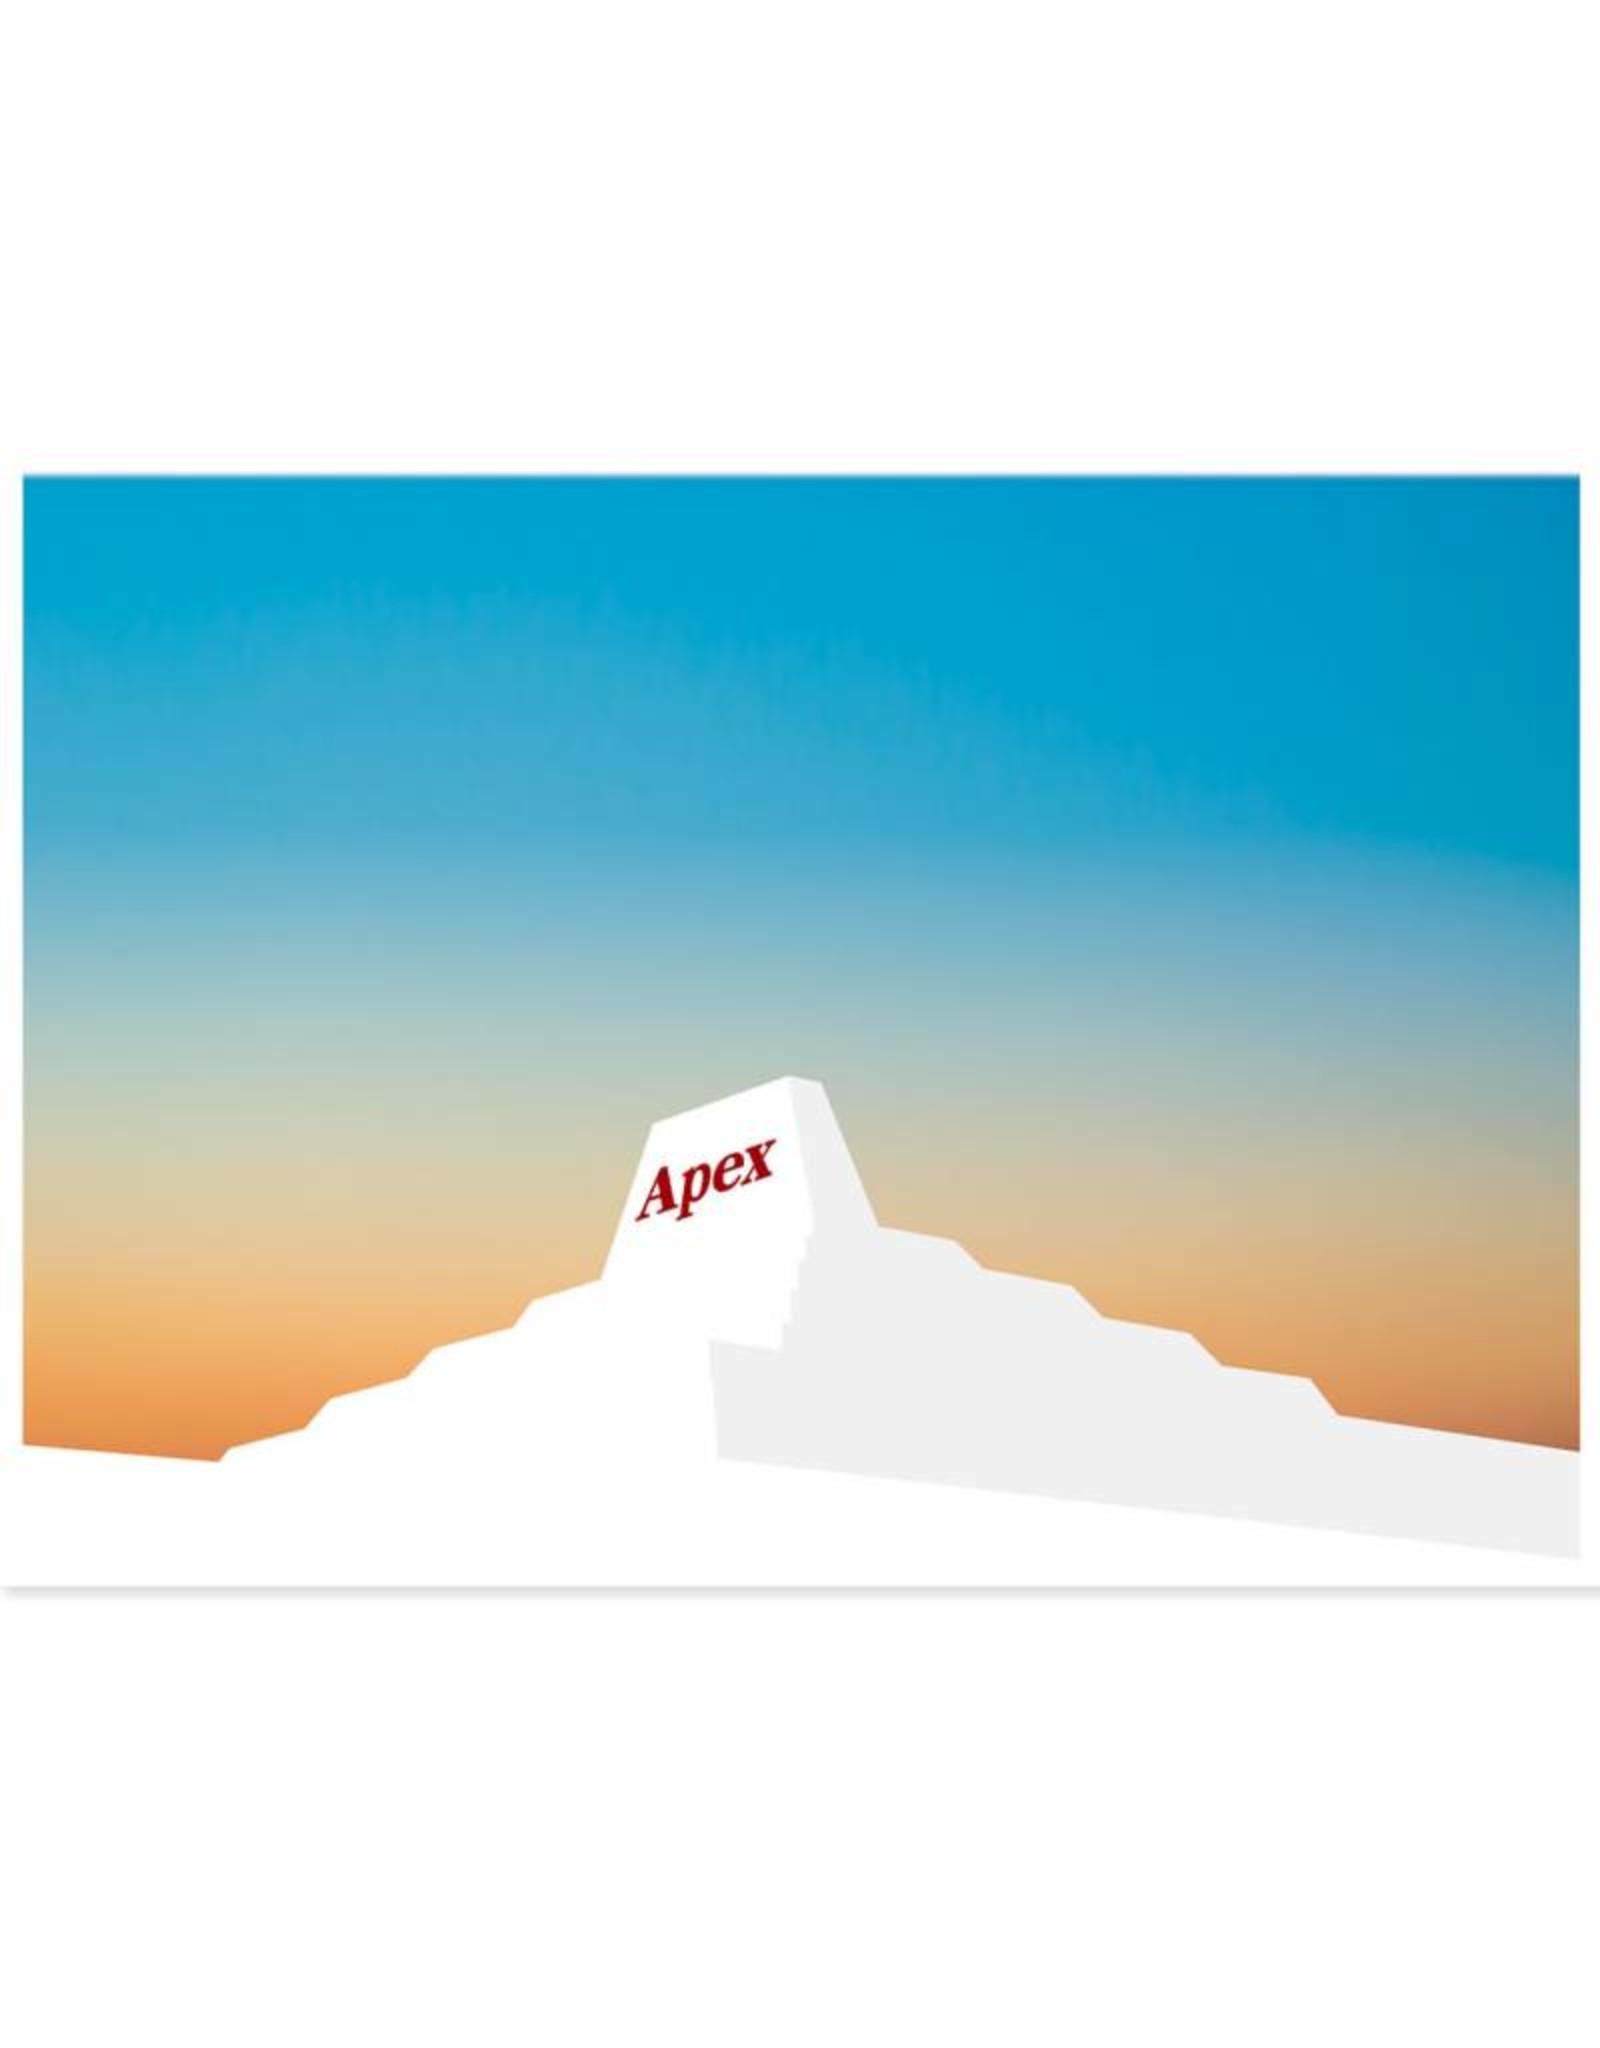 Apex Postcard